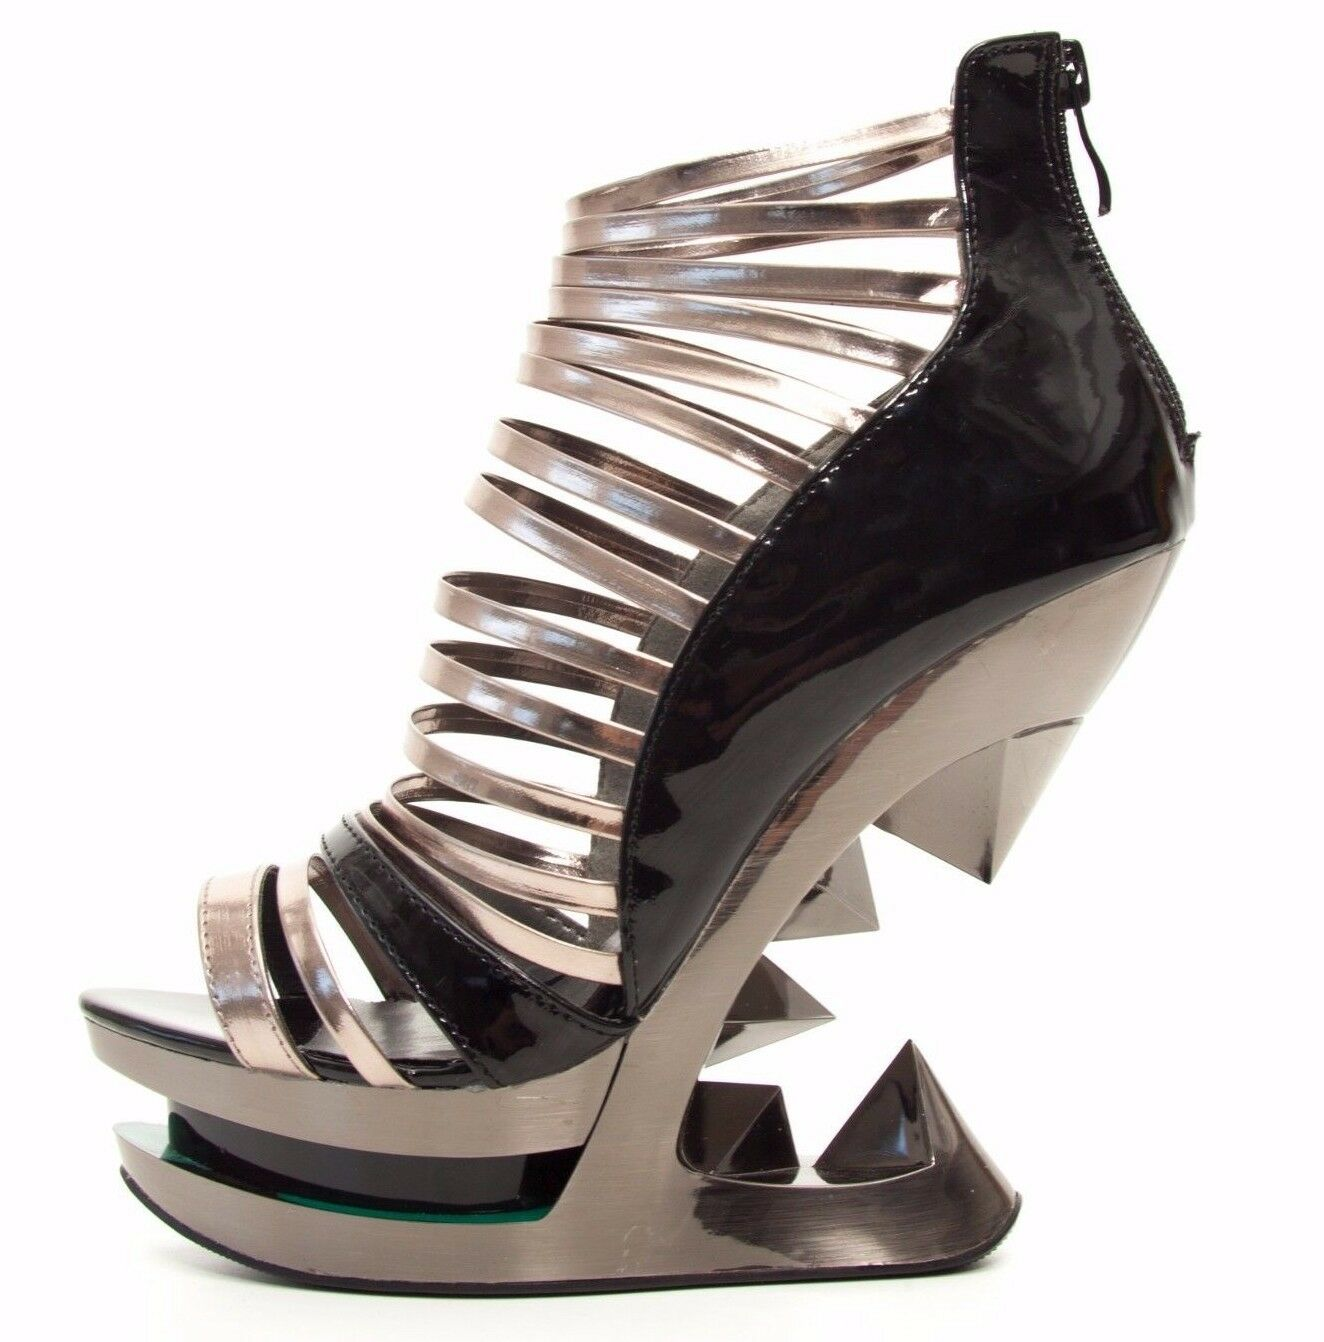 Hades discor Negro Patente Gun Metal Punta Abierta Con Correas Sandalias Zapatos de cuña Iceberg